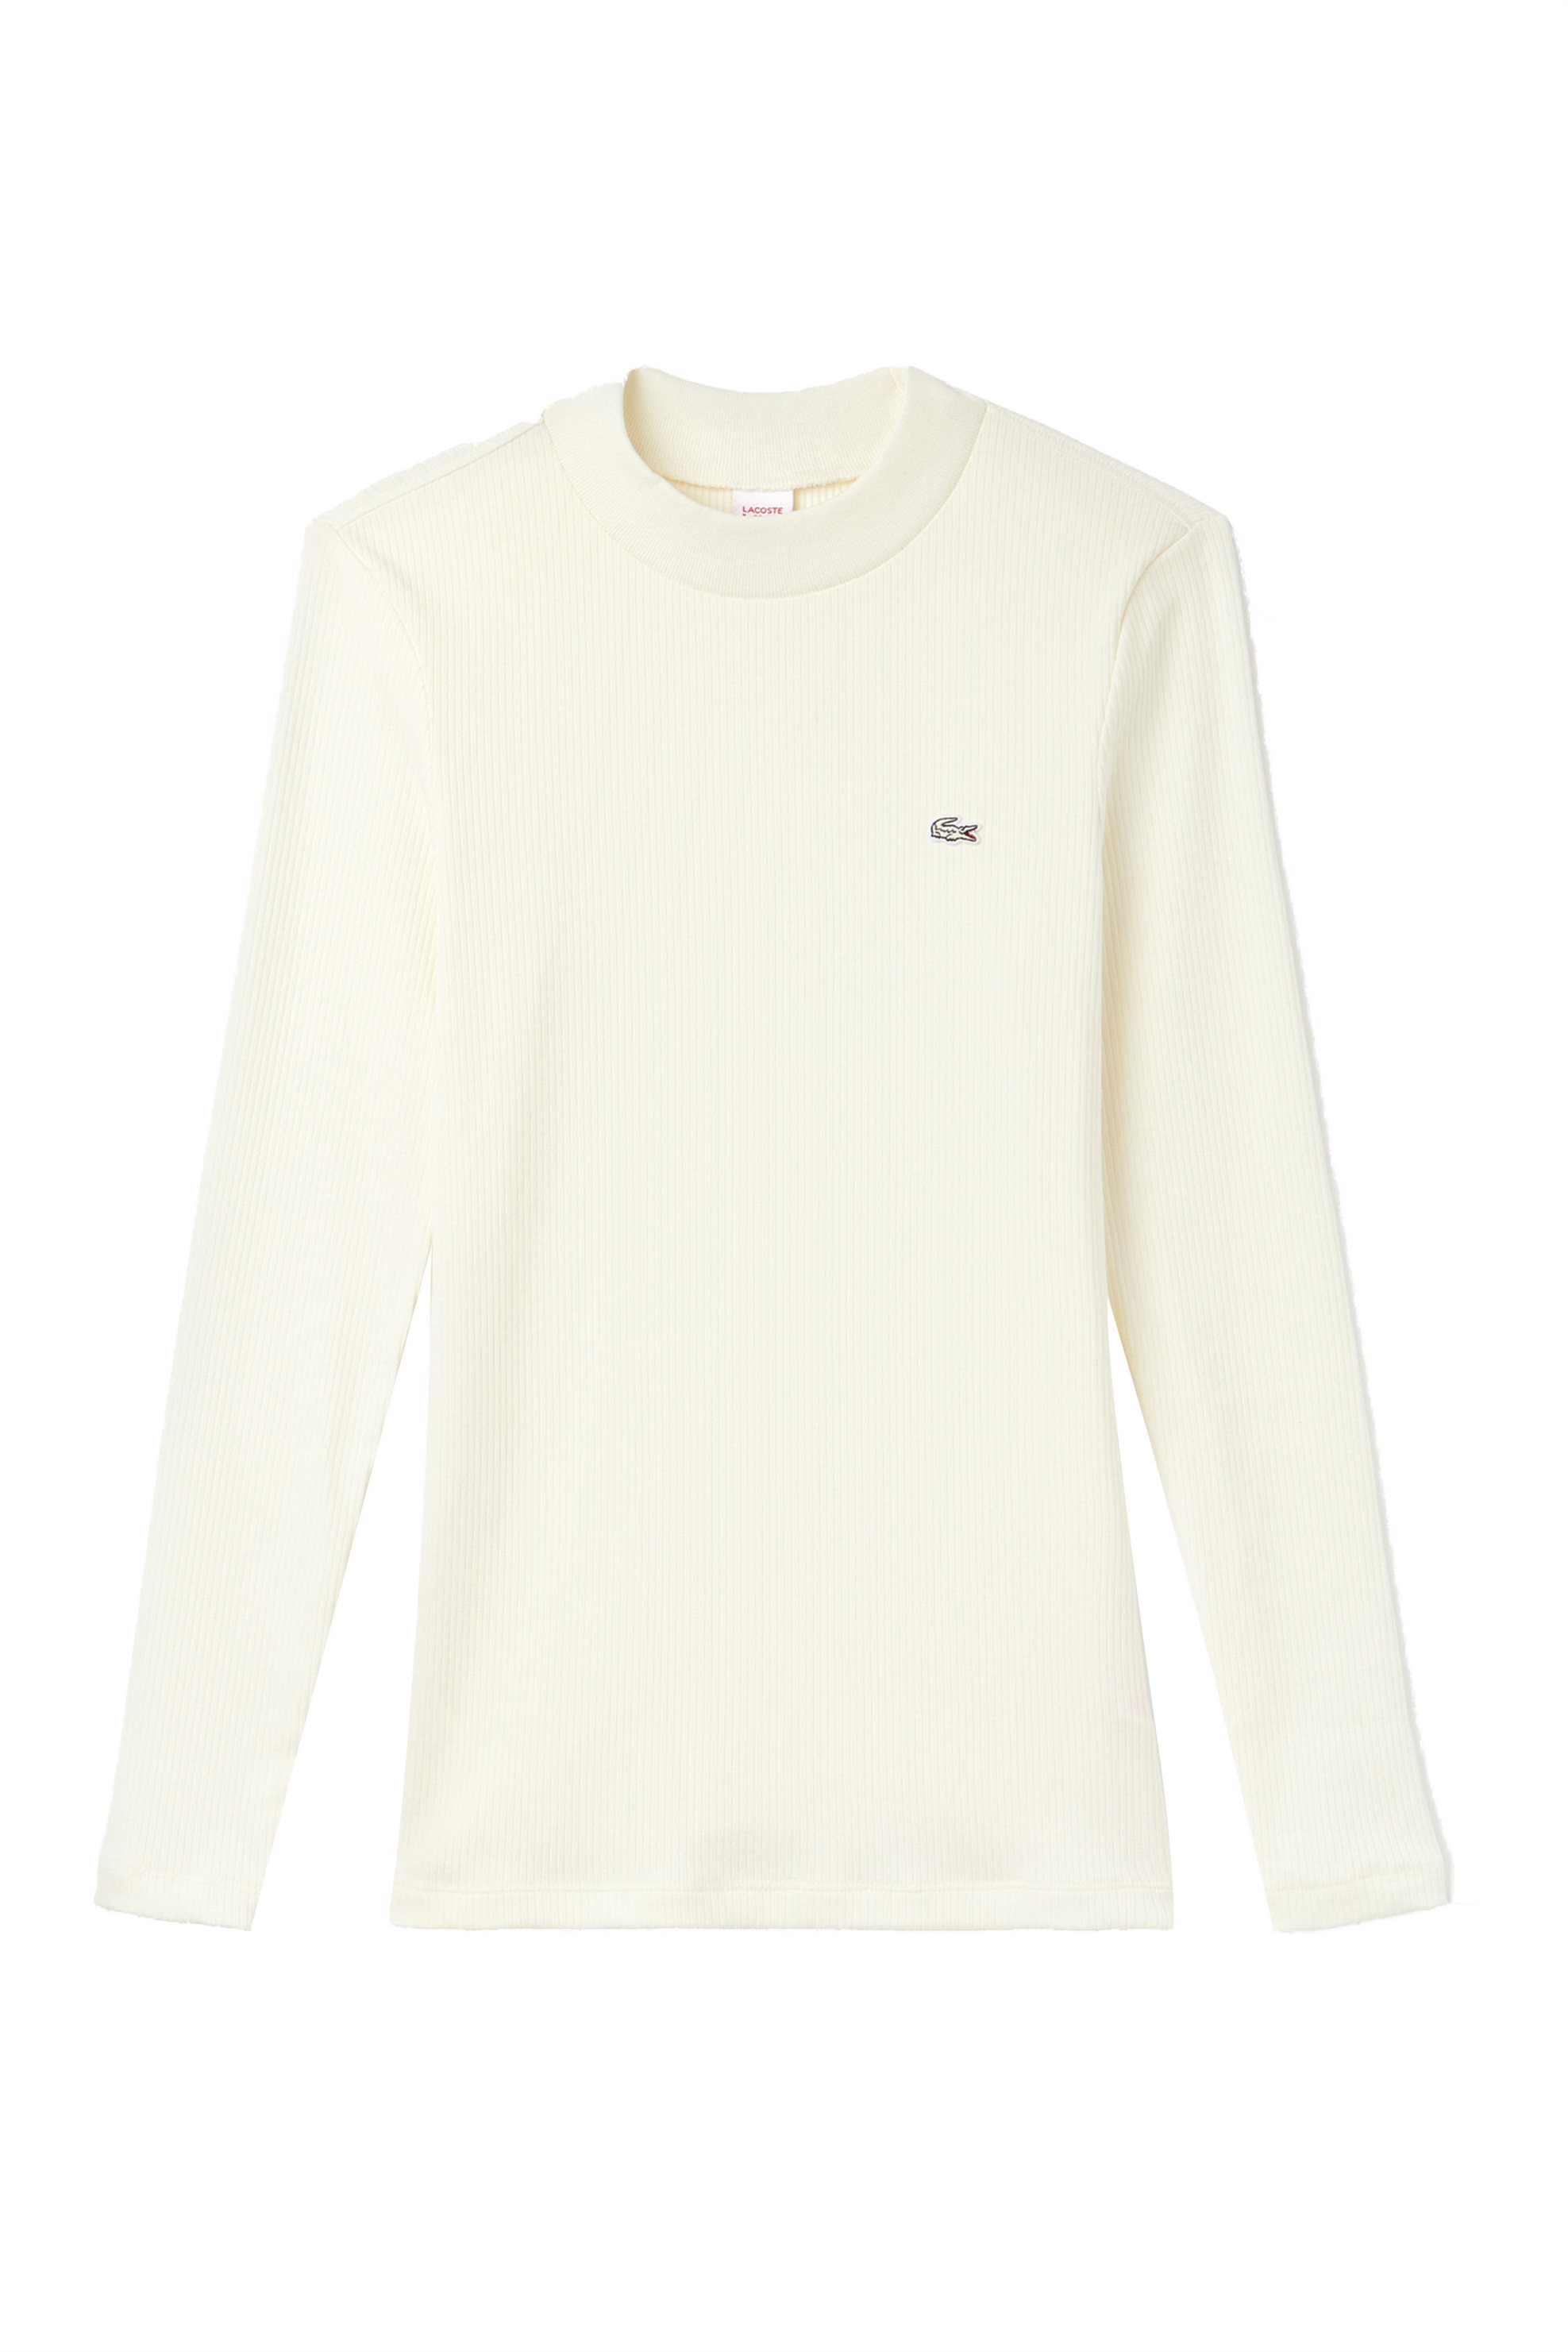 Lacoste γυναικεία μπλούζα μονόχρωμη Lacoste Live! Wild Side Collection  - TF896 γυναικα   ρουχα   tops   μπλούζες   casual